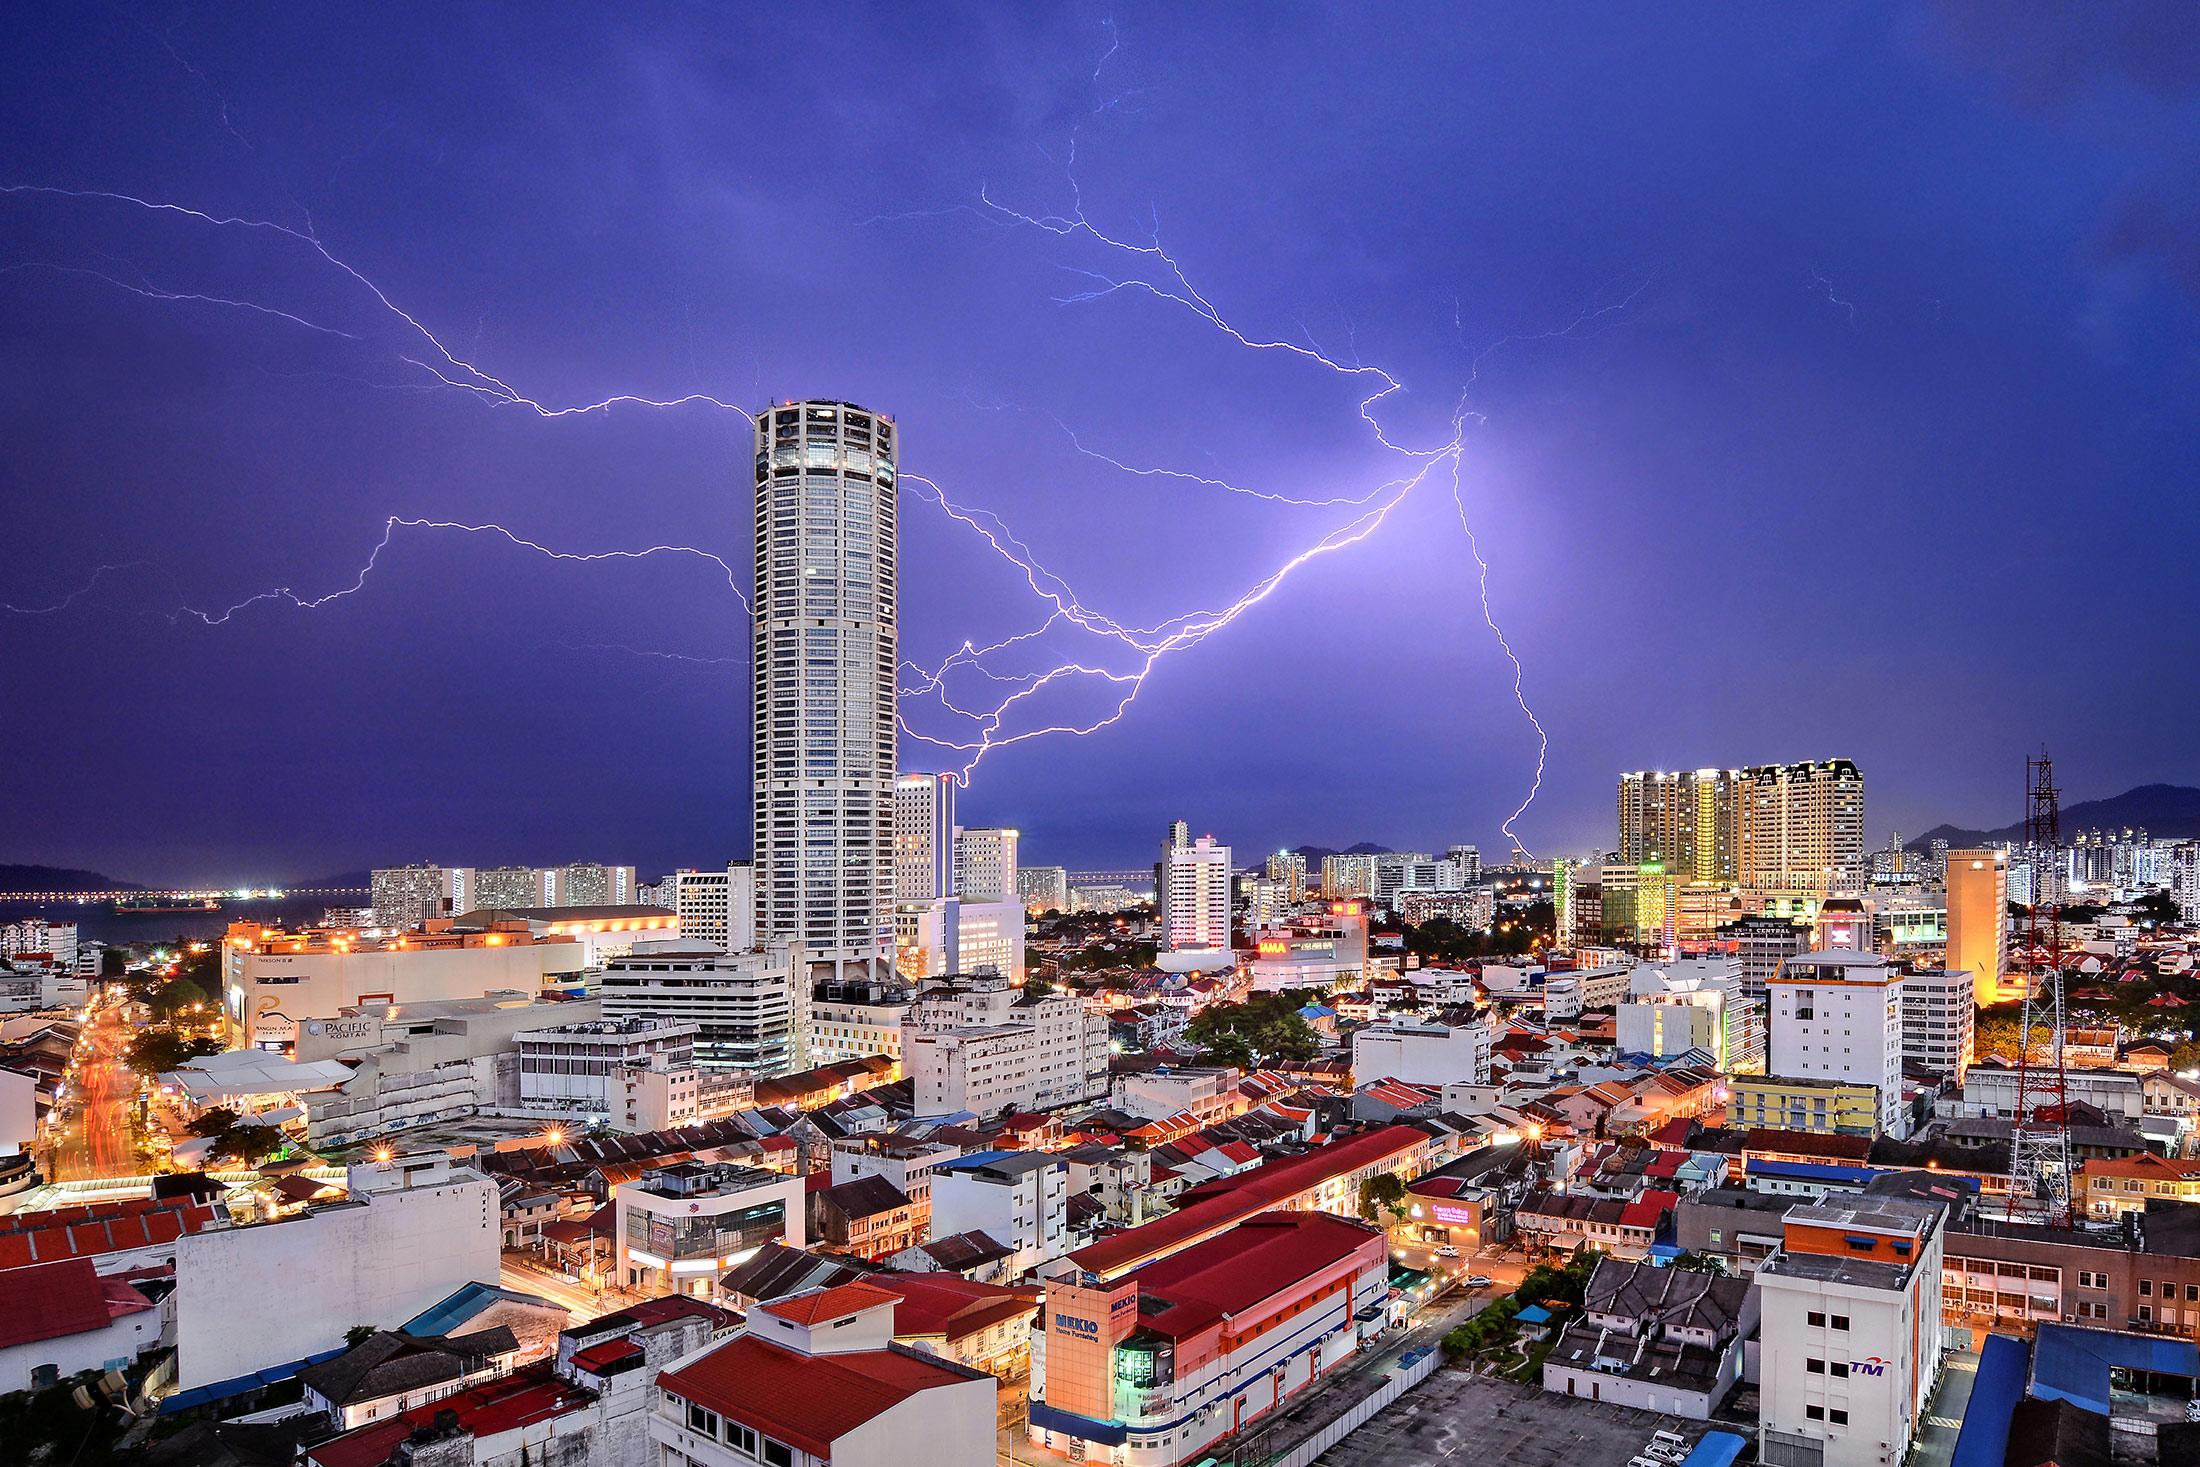 Cities Third Place: Celestial Reverie